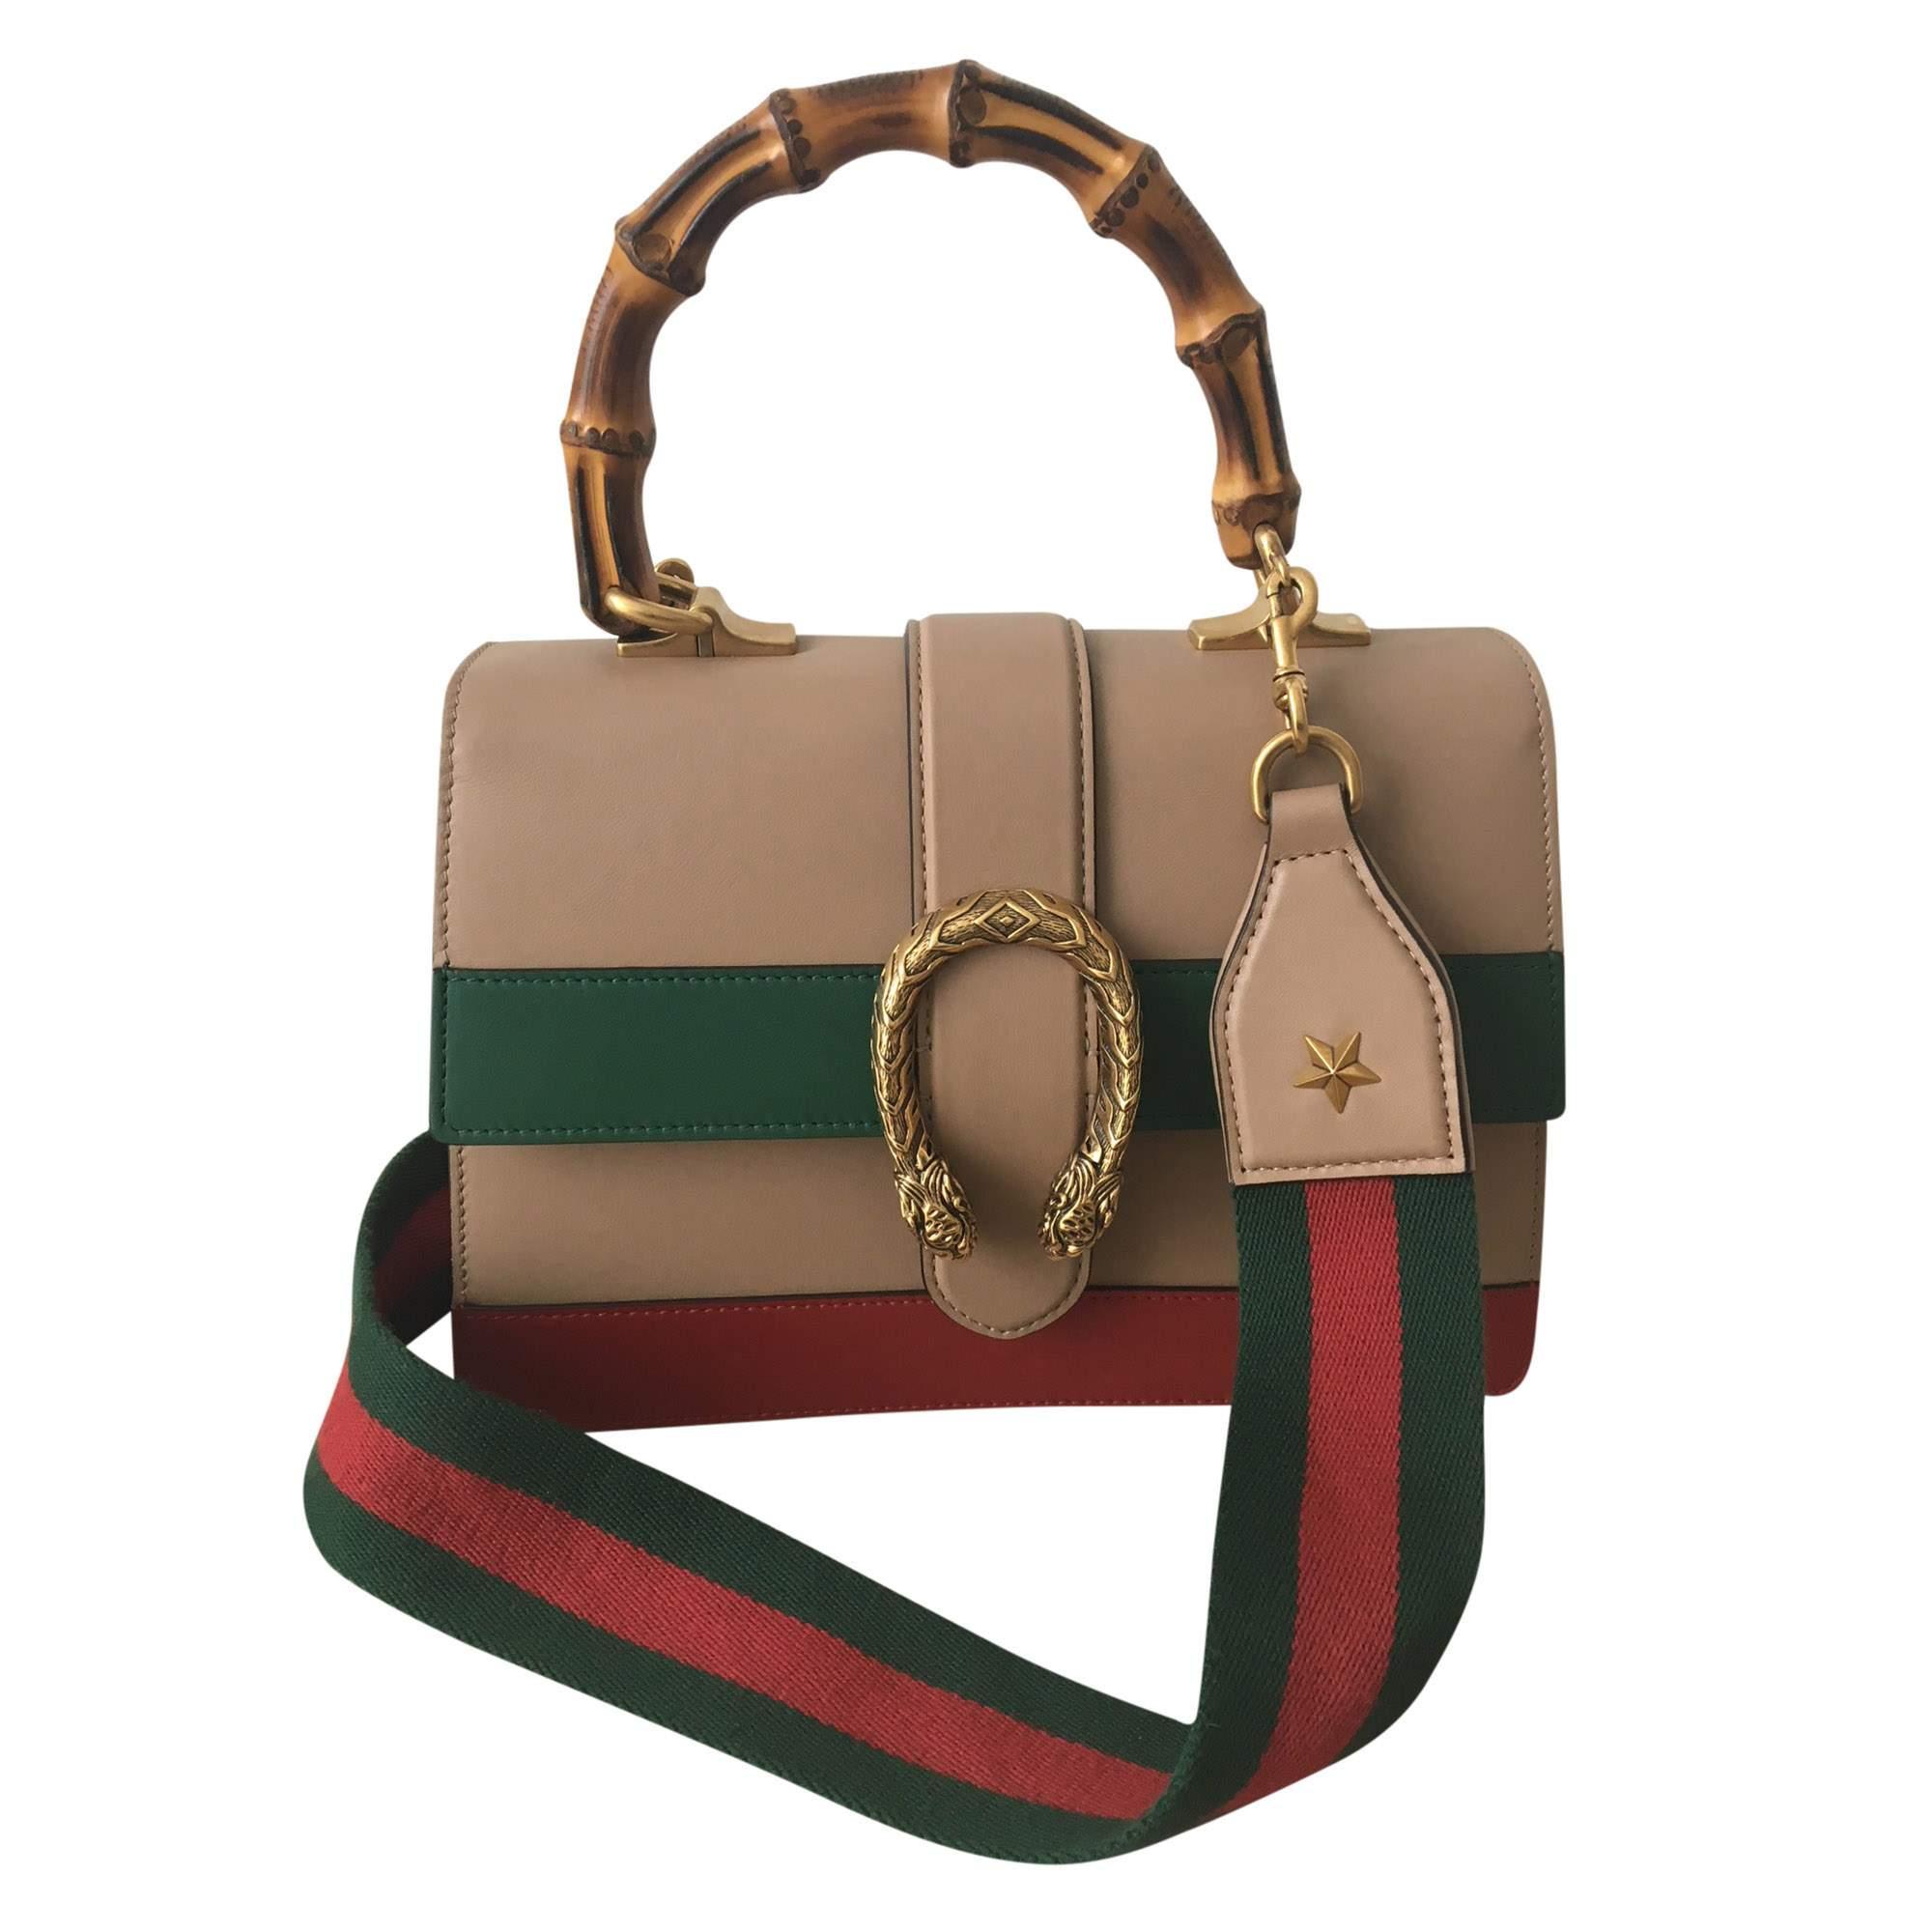 7984f0bd2 Gucci Dionysus Medium top handle Bag | The Chic Selection